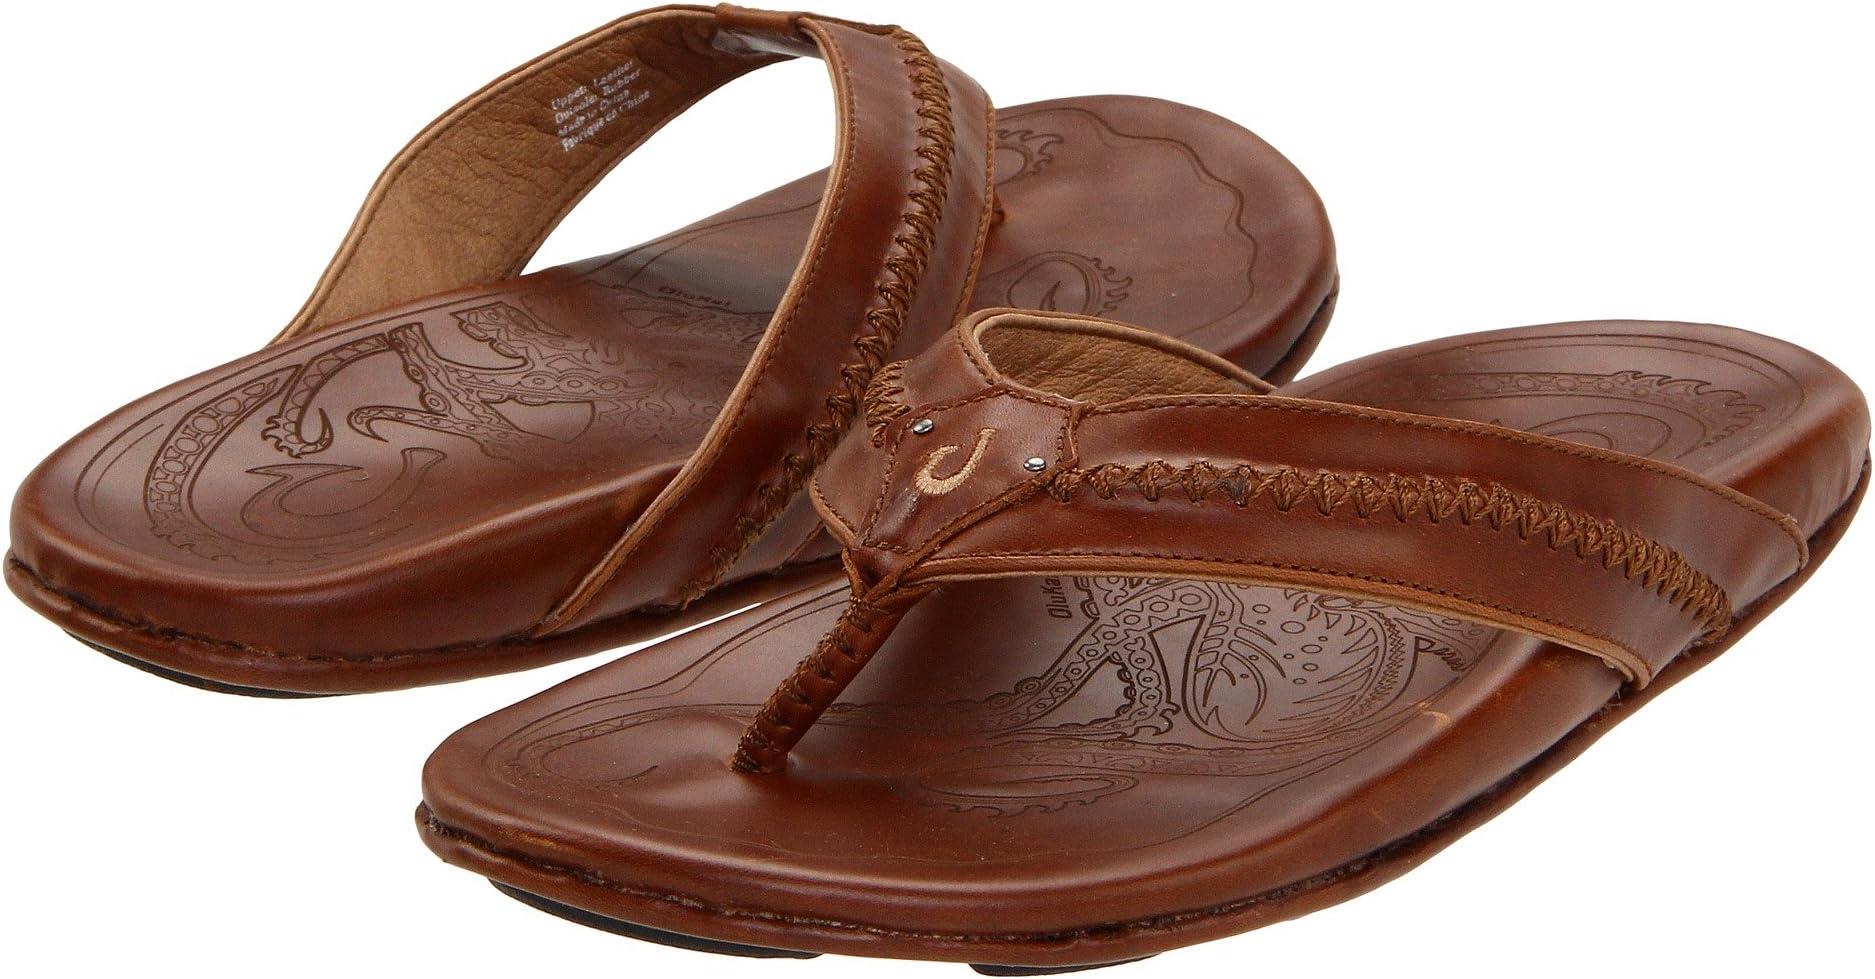 29c8acd905a6 OluKai Sandals